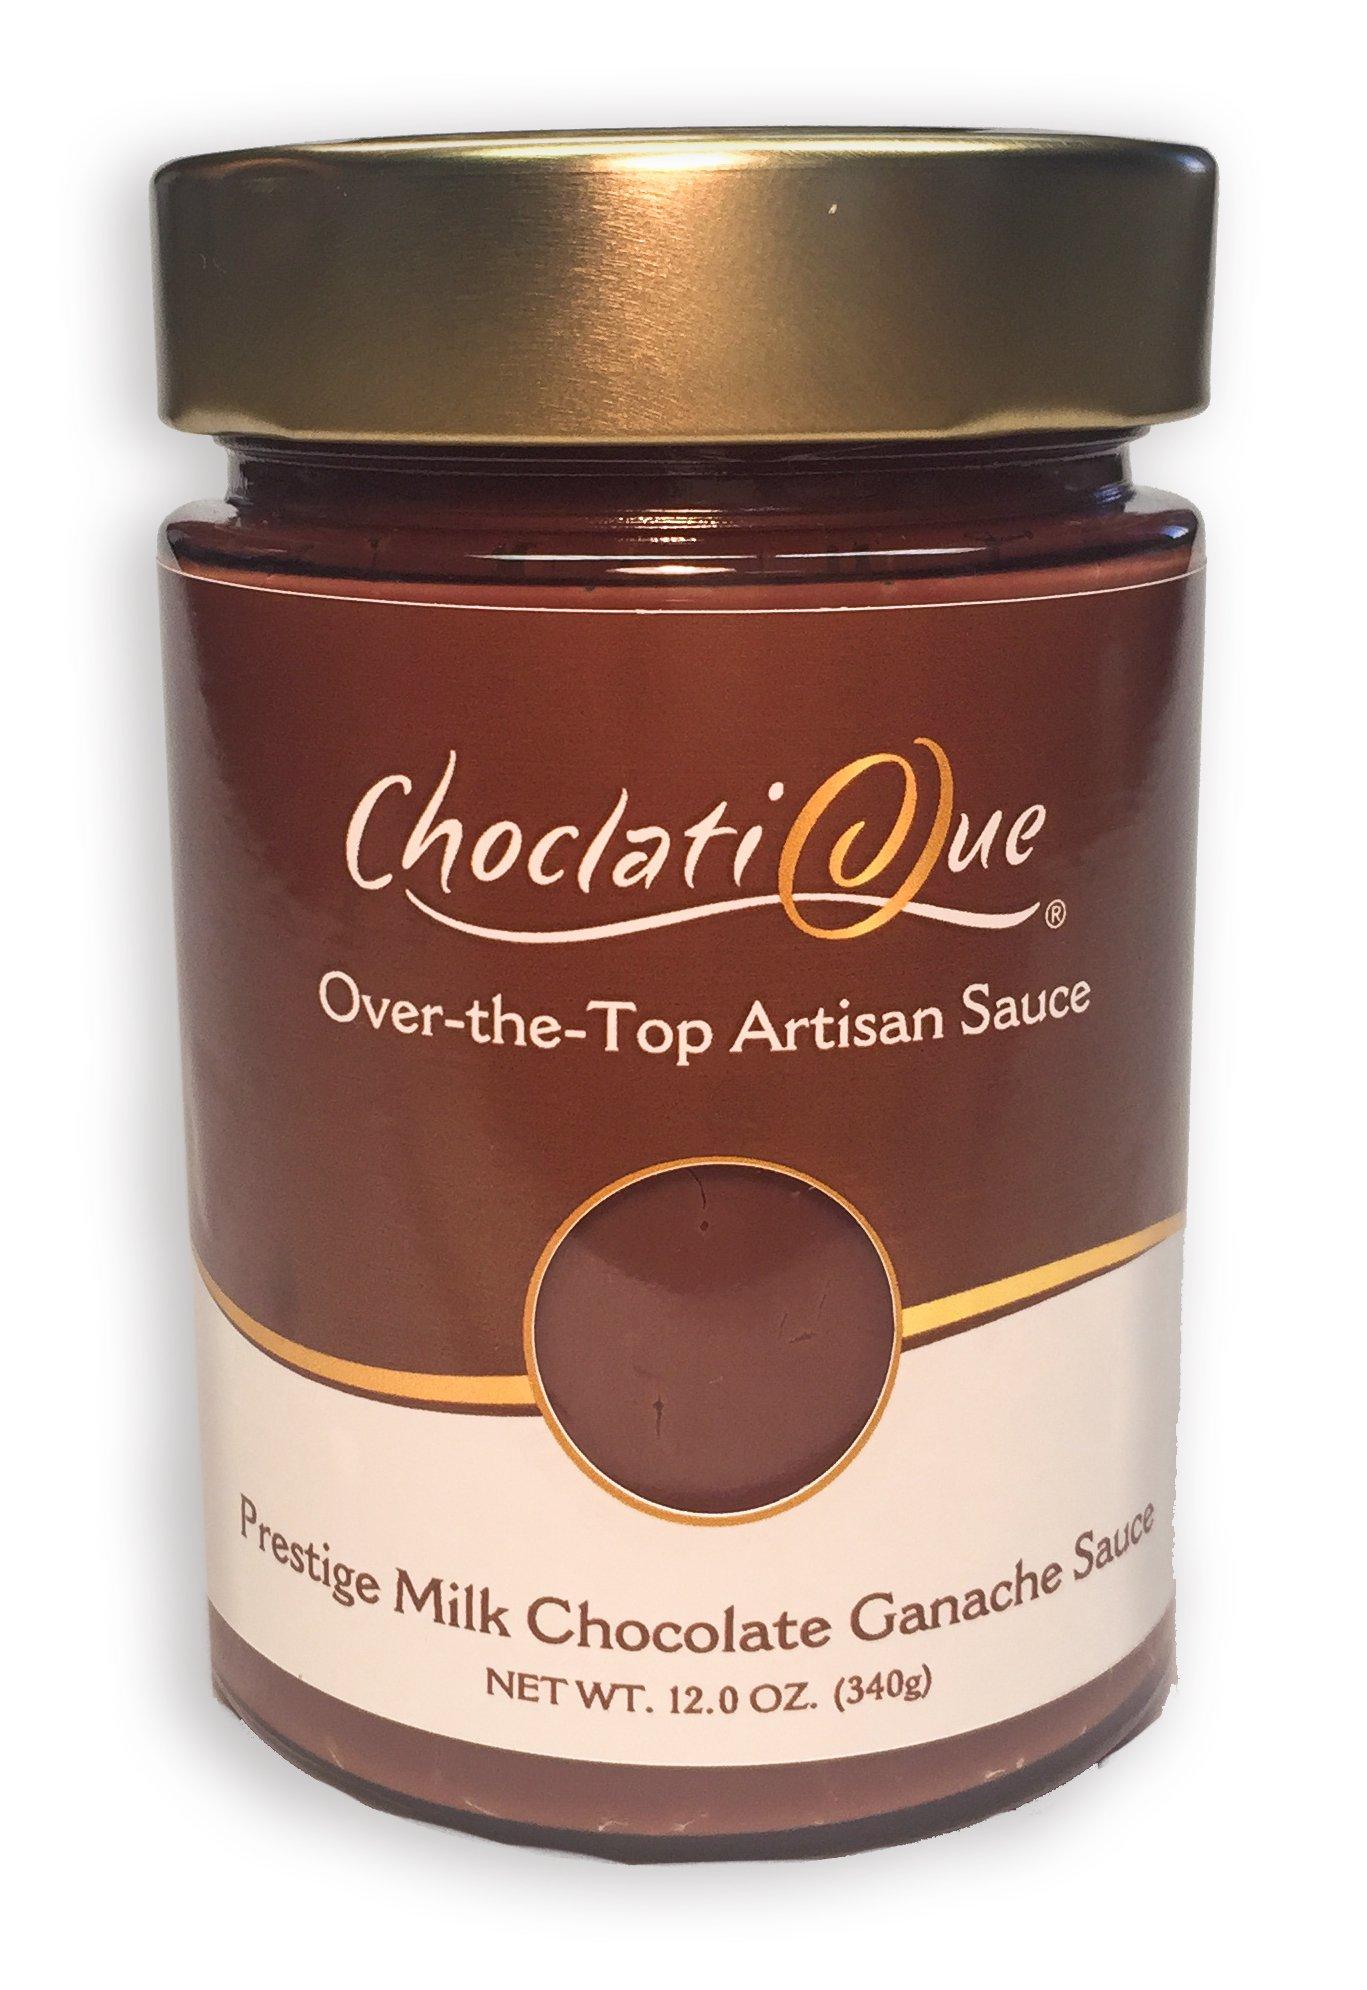 Prestige Milk Chocolate Ganache Sauce